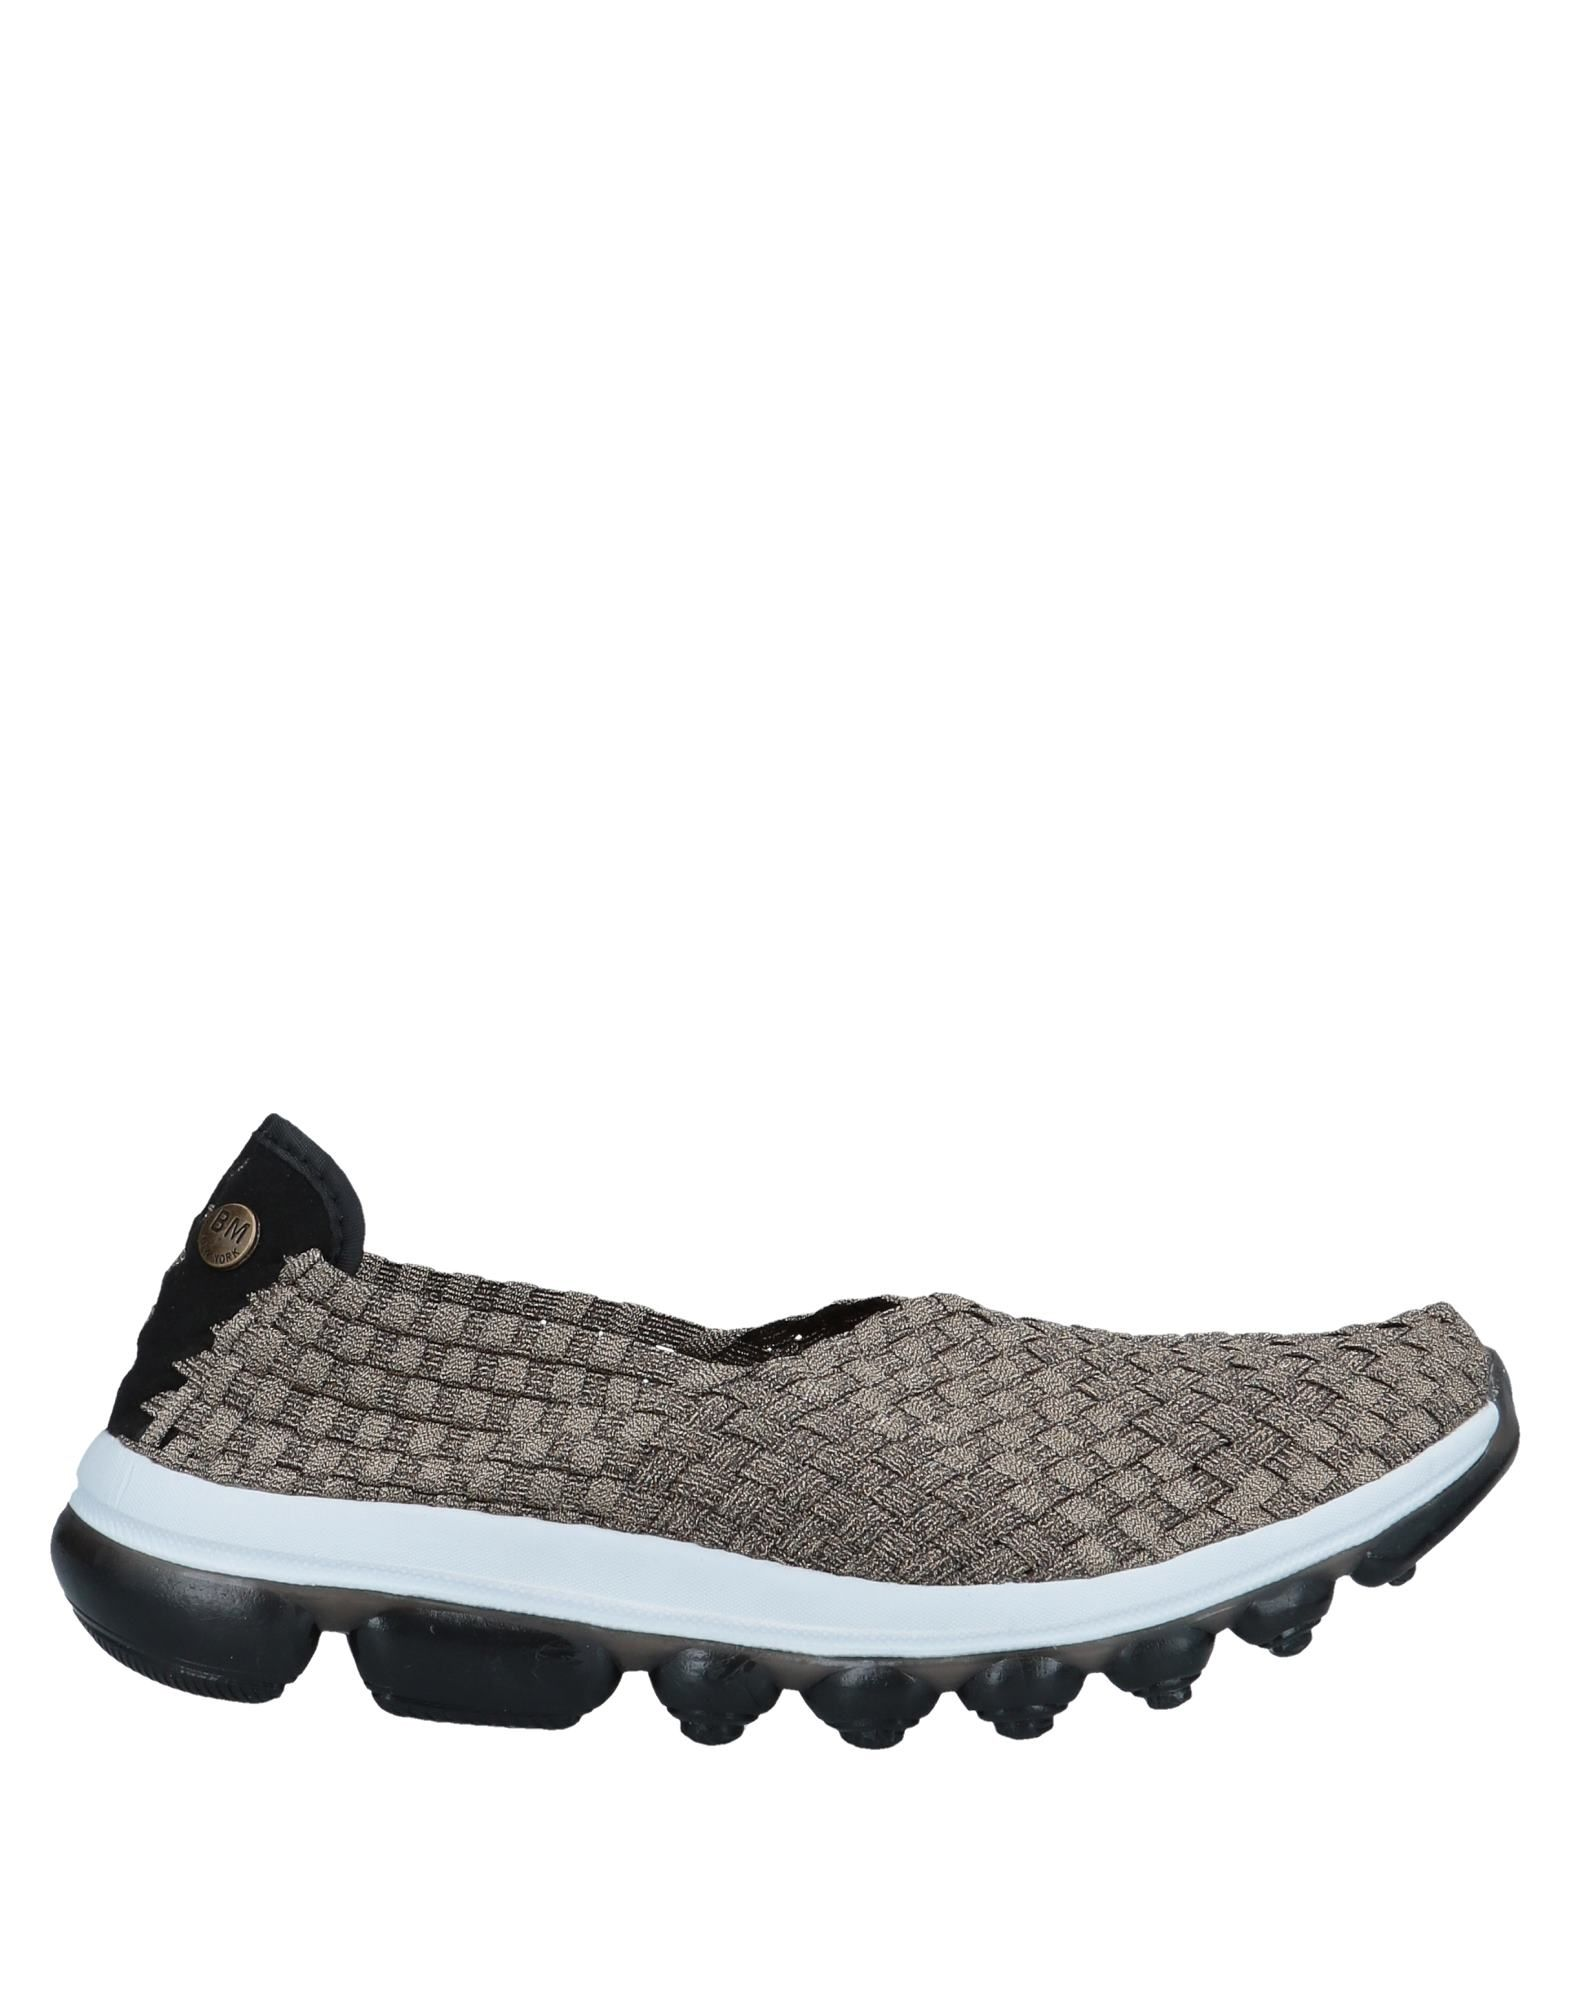 Bernie Mev. Mev. Sneakers - Women Bernie Mev. Mev. Sneakers online on  United Kingdom - 11564268AG 9abeab